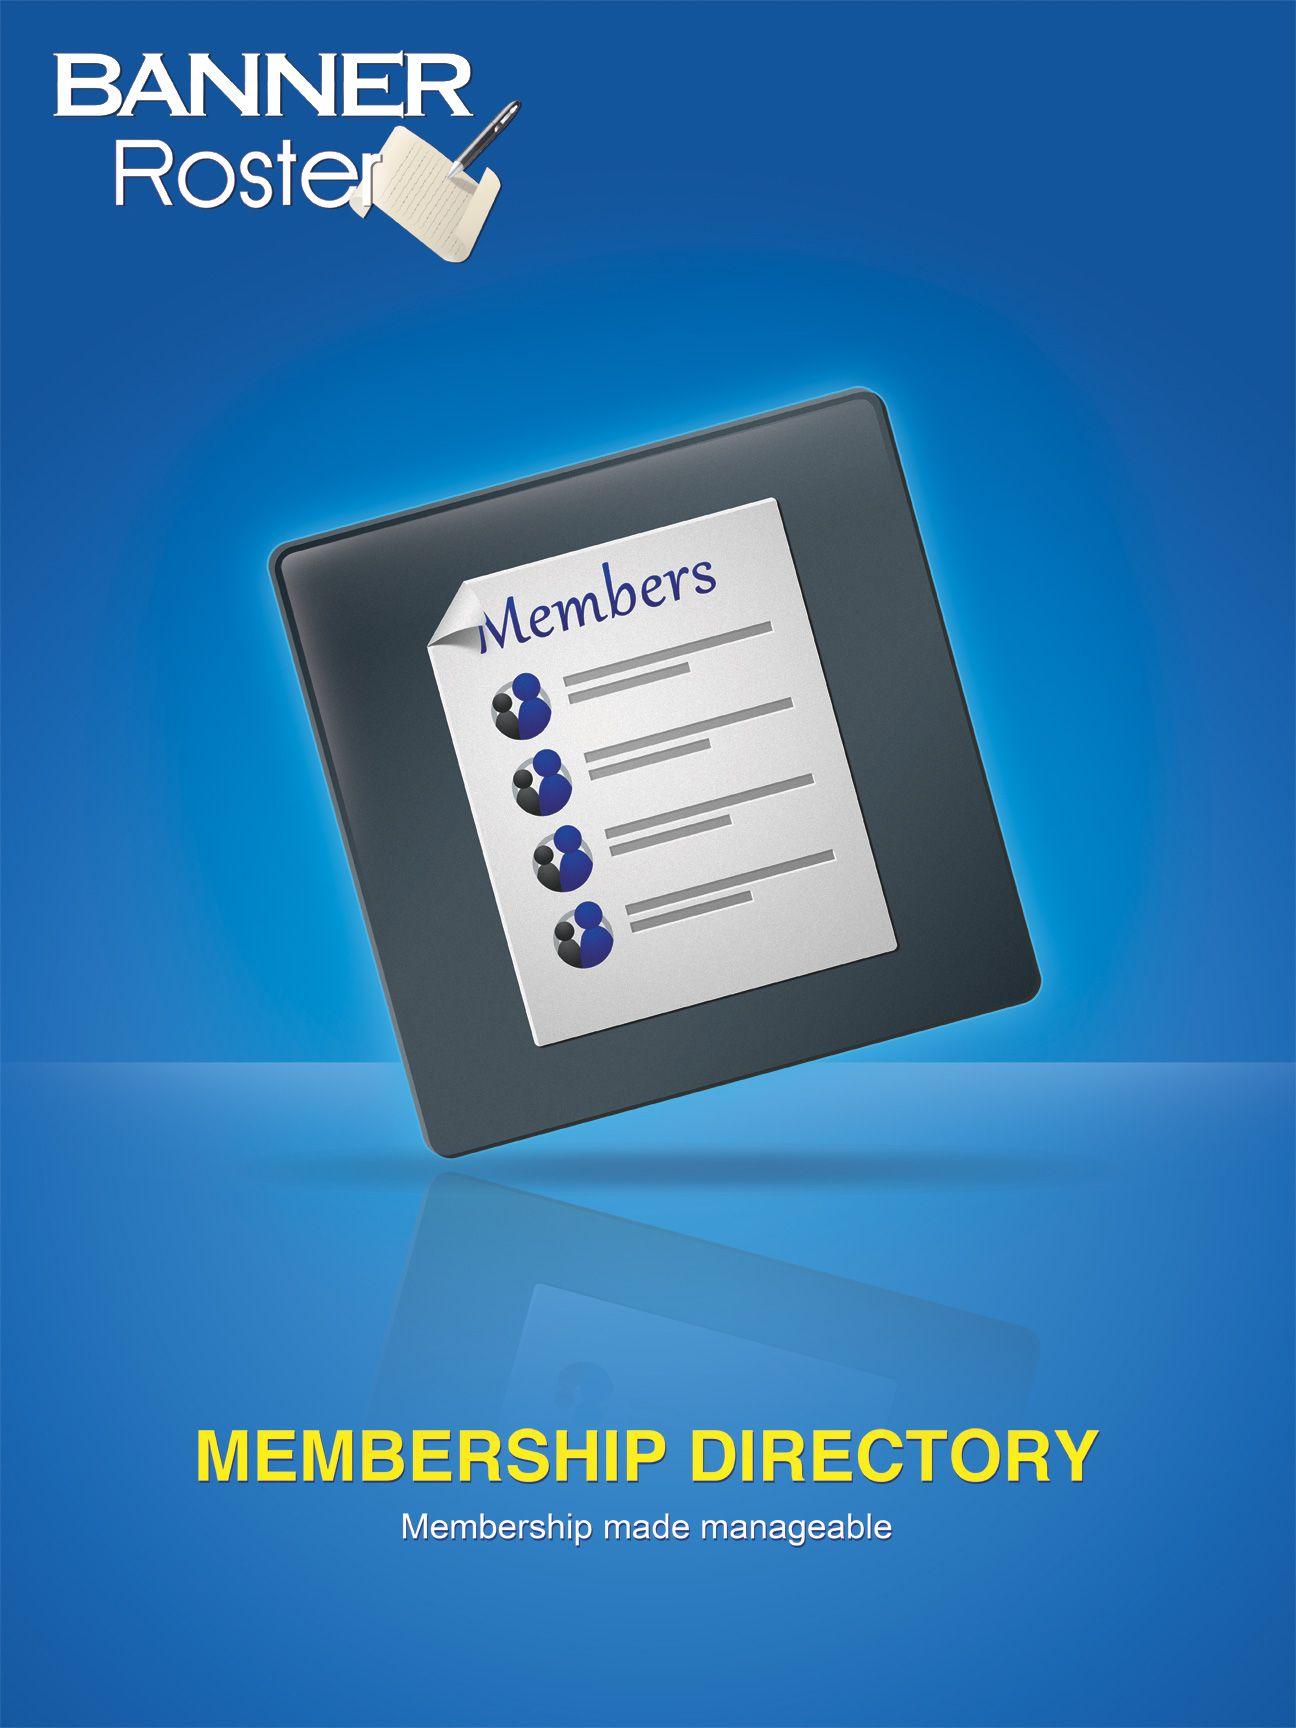 Membership Directory Manager